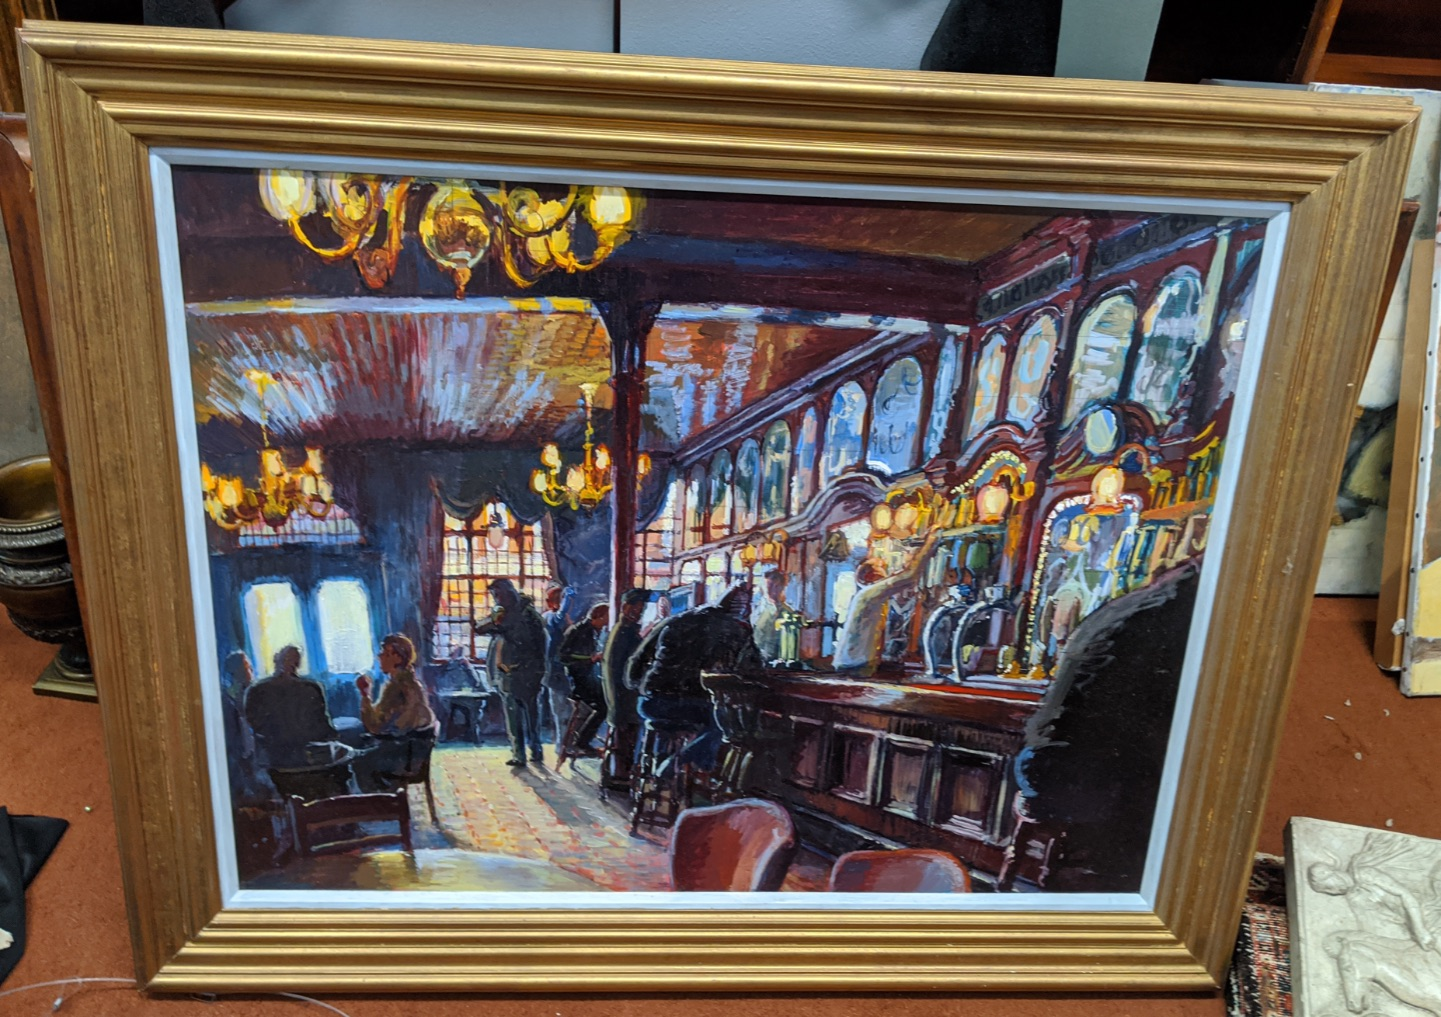 Gary Jeffrey (Contemporary British), The Spread Eagle Pub, Wandsworth, oil on board, H.66cm W.86.5cm - Image 2 of 3